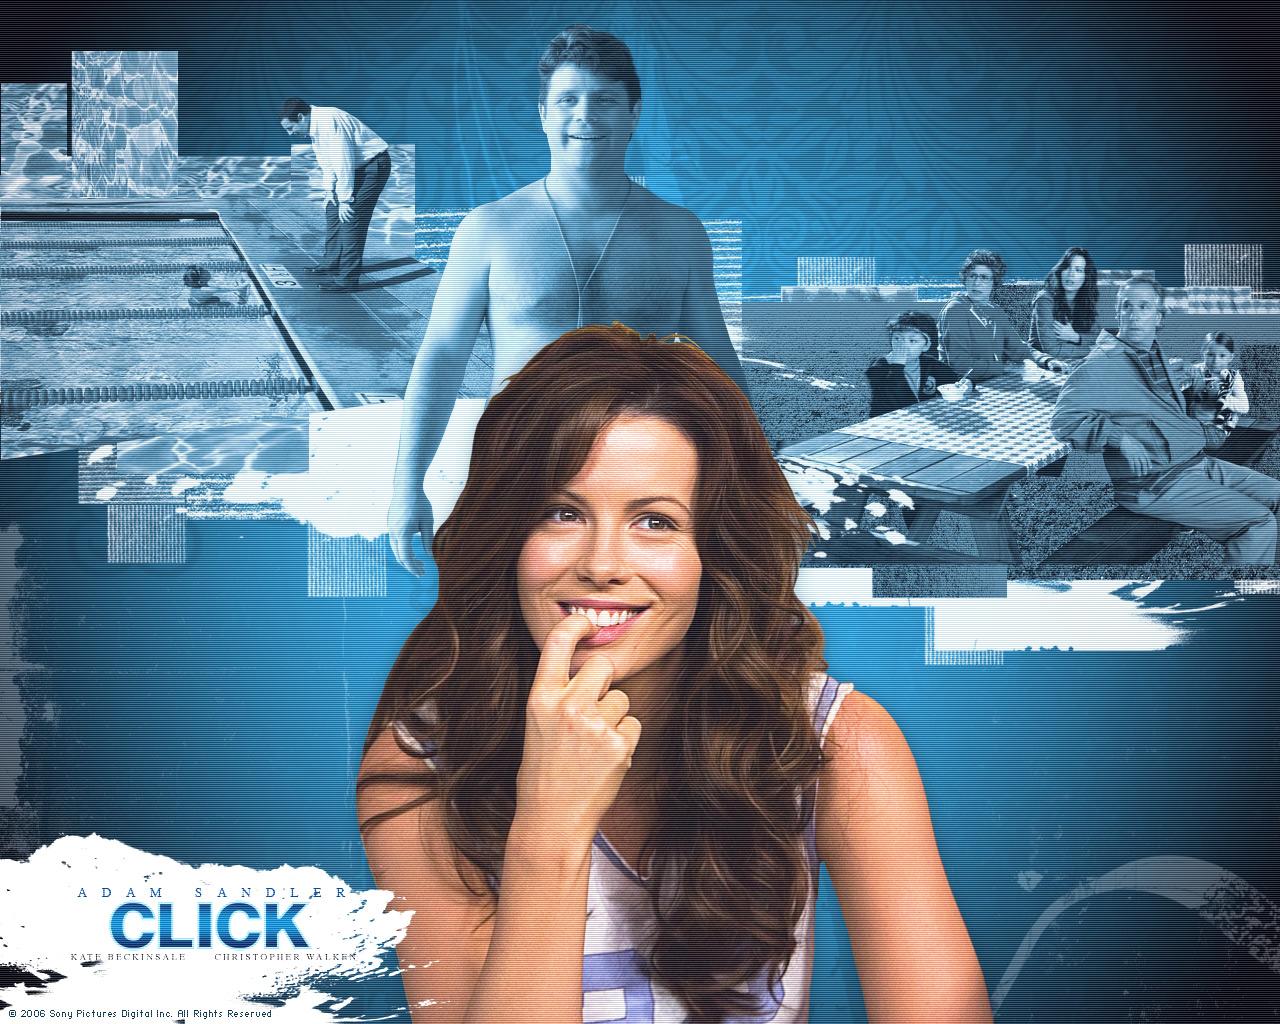 Click - Life as a movie